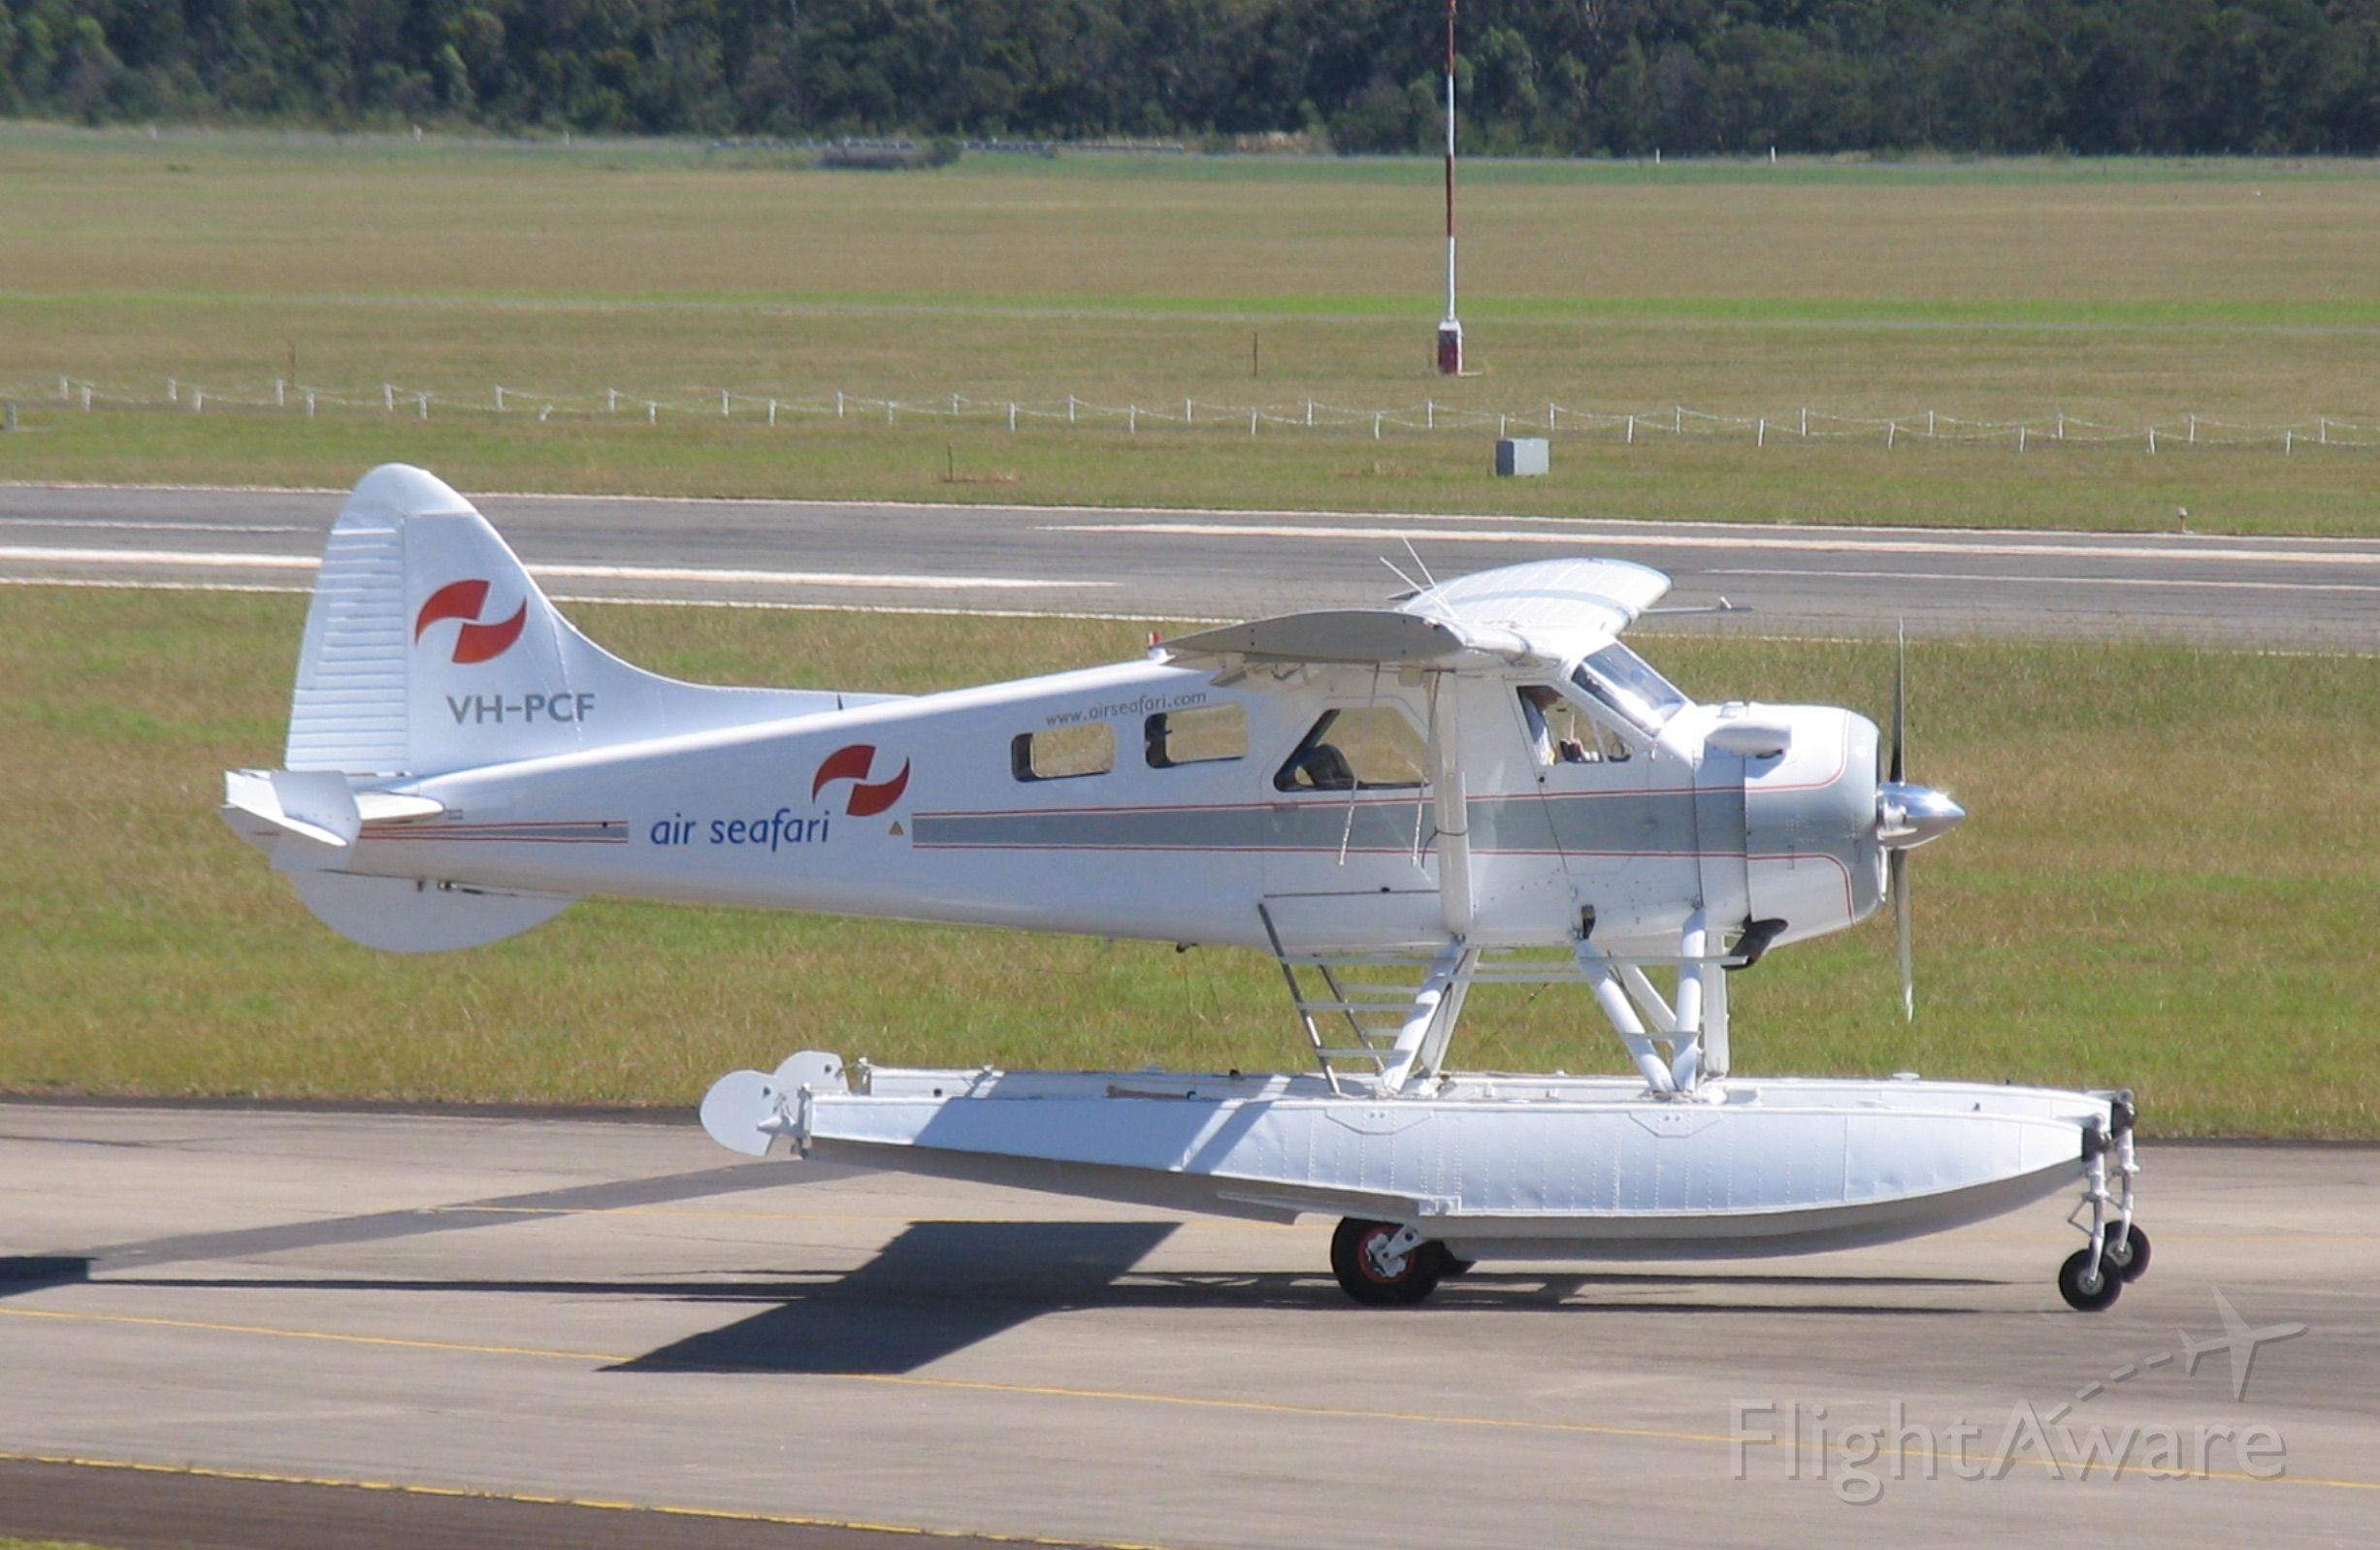 De Havilland Canada DHC-2 Mk1 Beaver (VH-PCF) - de Havilland Canada DHC-2 Mk.I Beaver<br />Manufactured in 1959, Canada<br />Photo: 26.03.2006